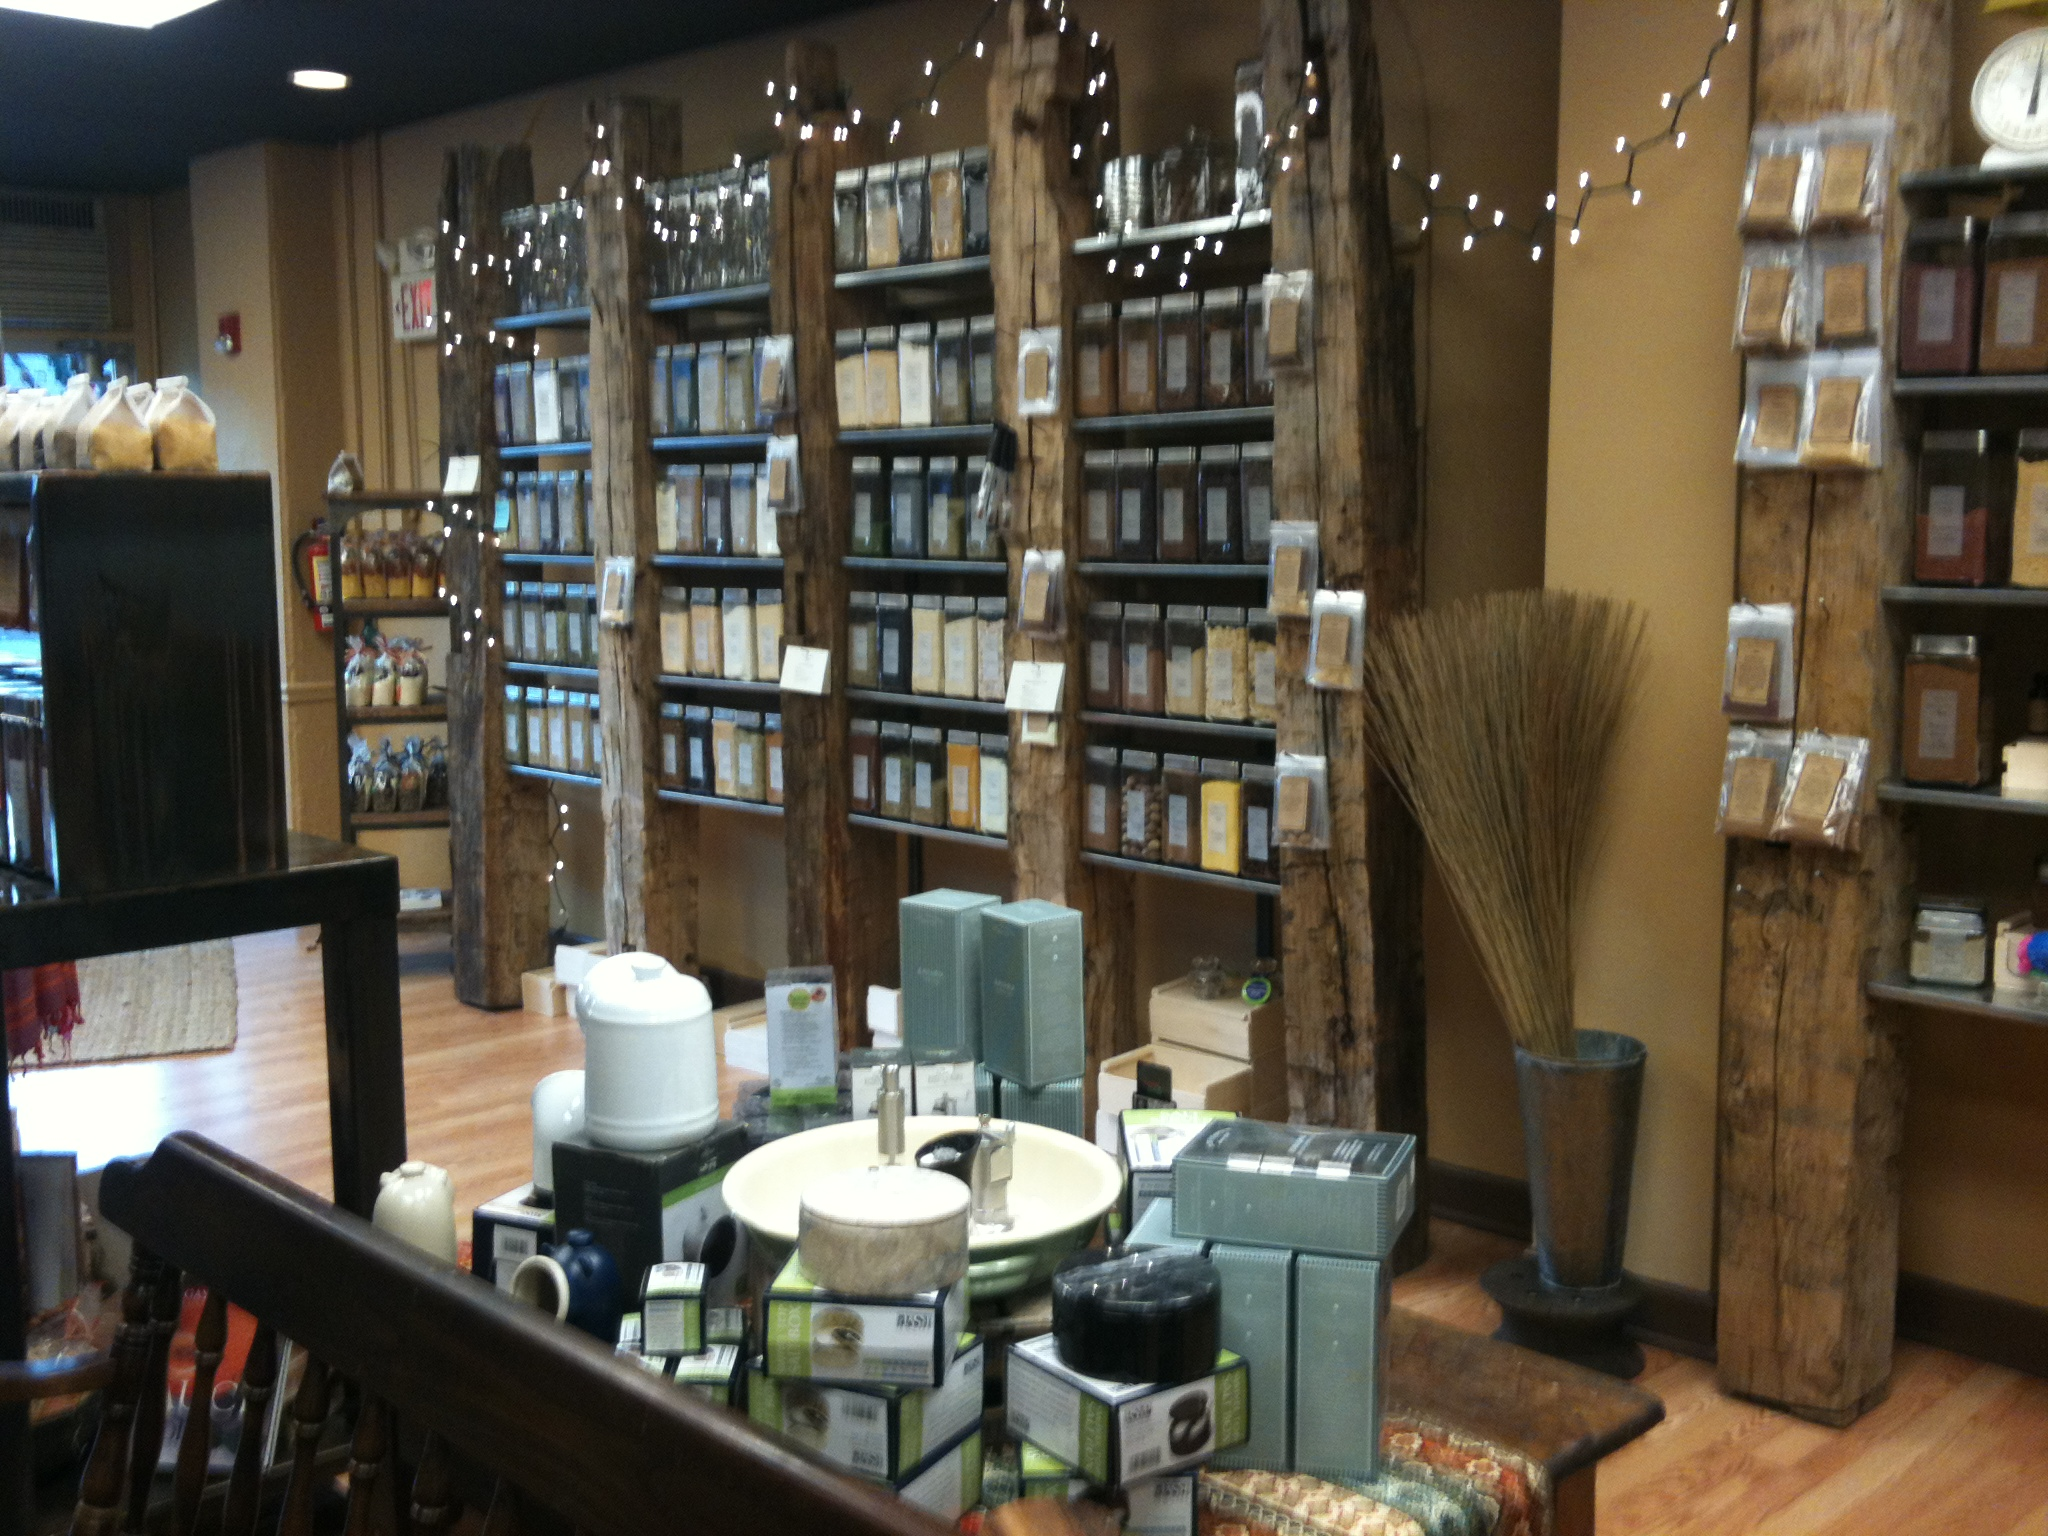 Spice Merchants Quot A Rockin Cool Place That Smells Good